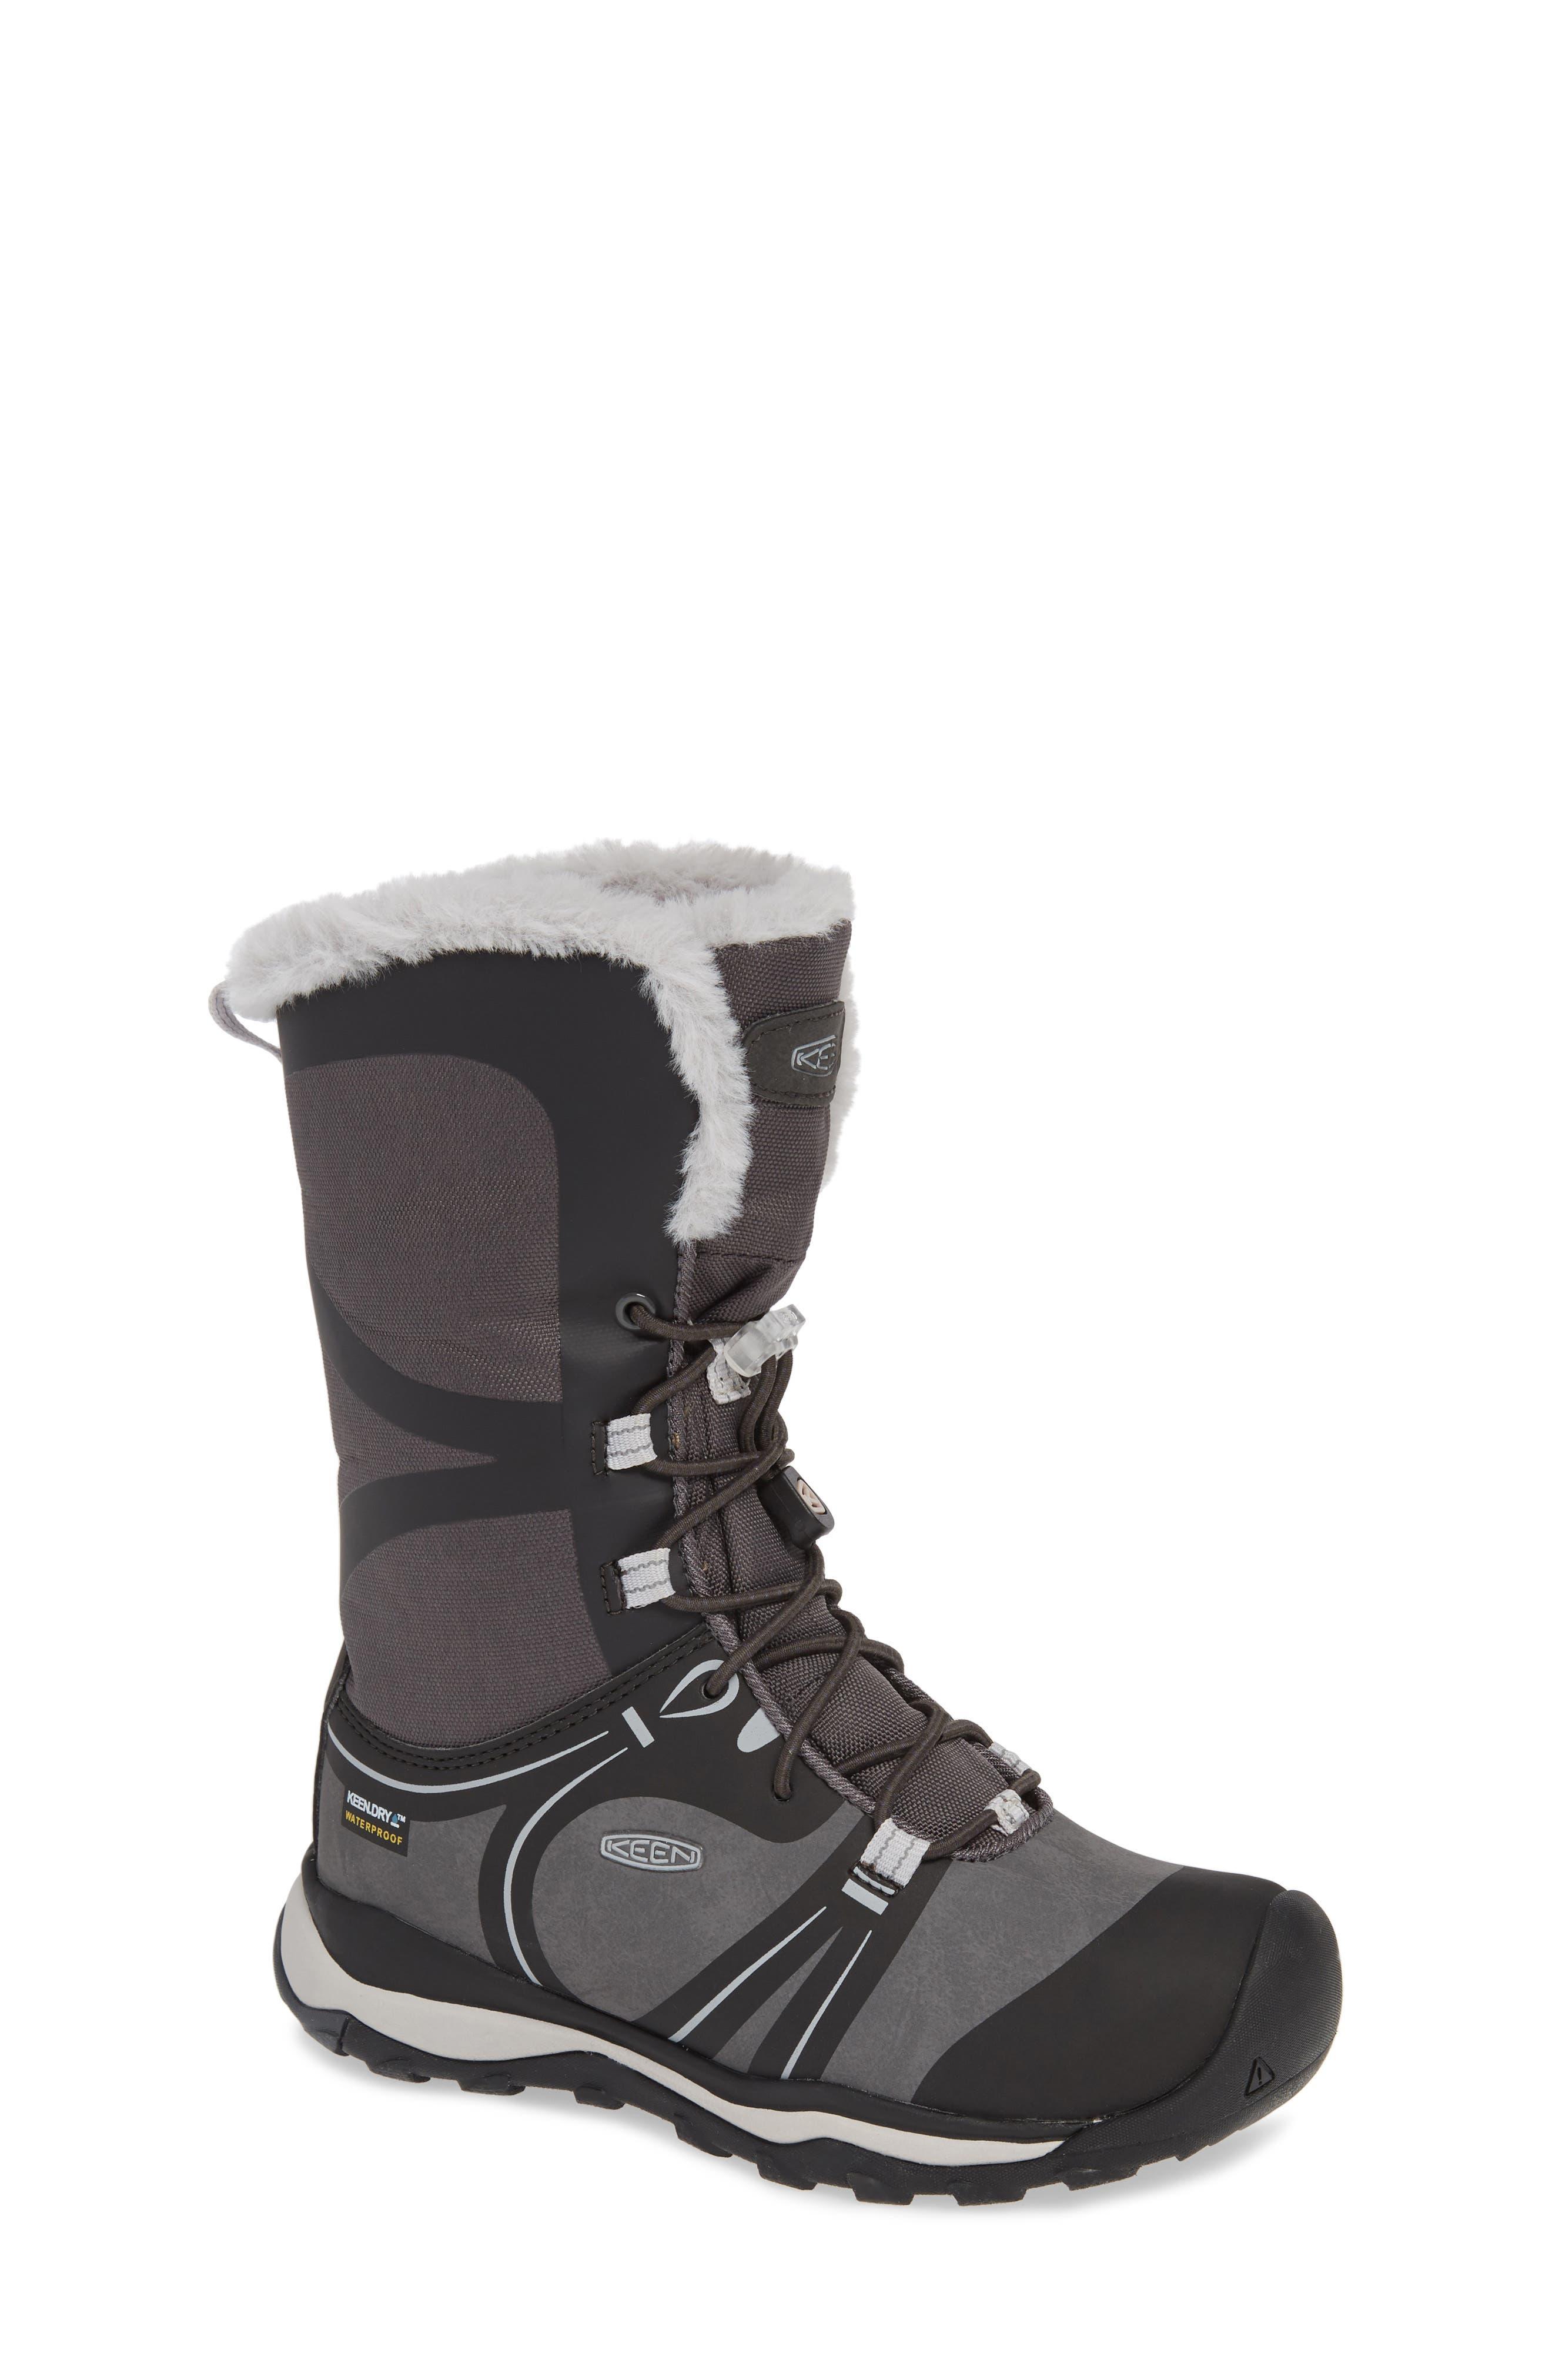 KEEN, Terradora Faux Fur Trim Waterproof Snow Boot, Main thumbnail 1, color, RAVEN/ VAPOR